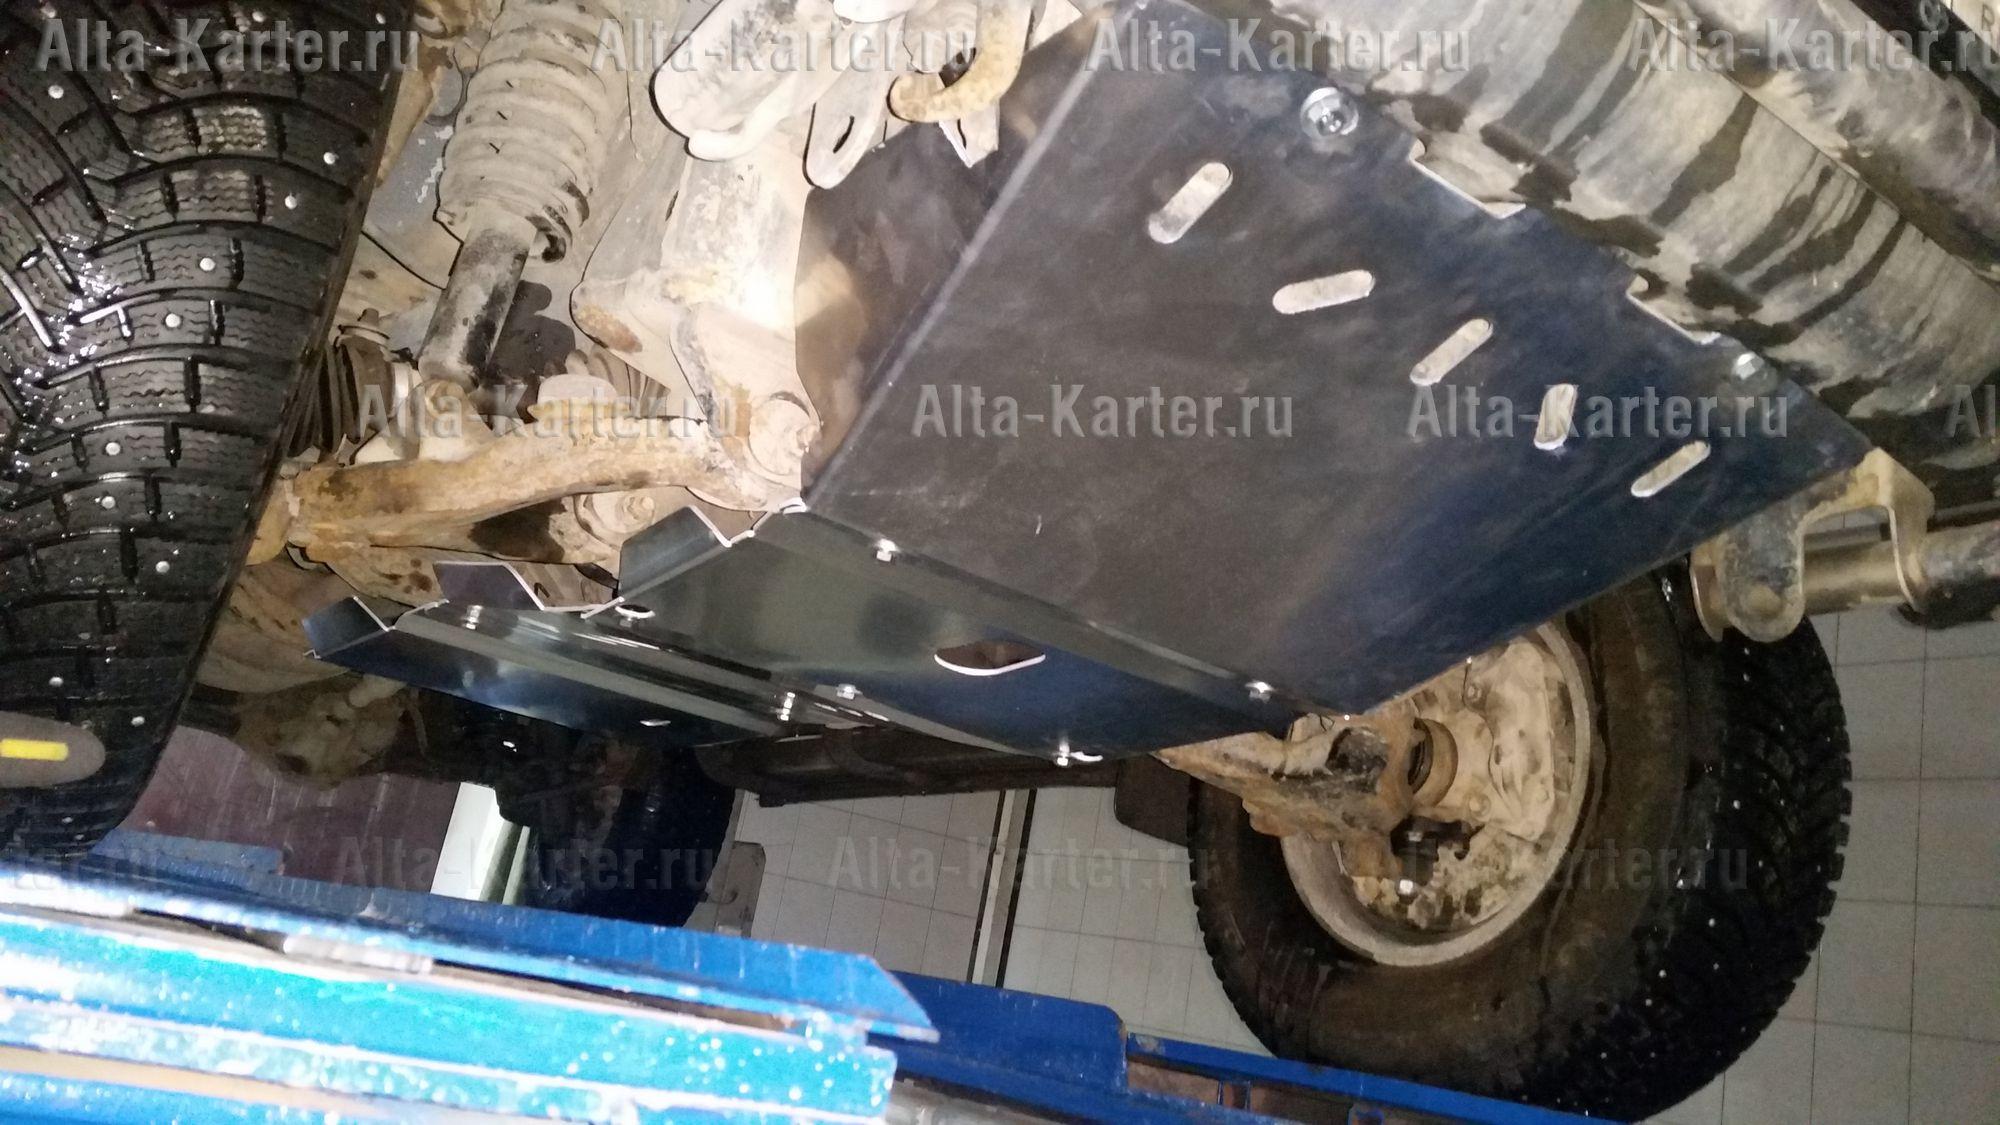 Защита Alfeco для радиатора, картера, КПП и раздатки Toyota Land Cruiser 90 5 дв. 1996-2002. Артикул ALF.24.109+ALF.24.110st